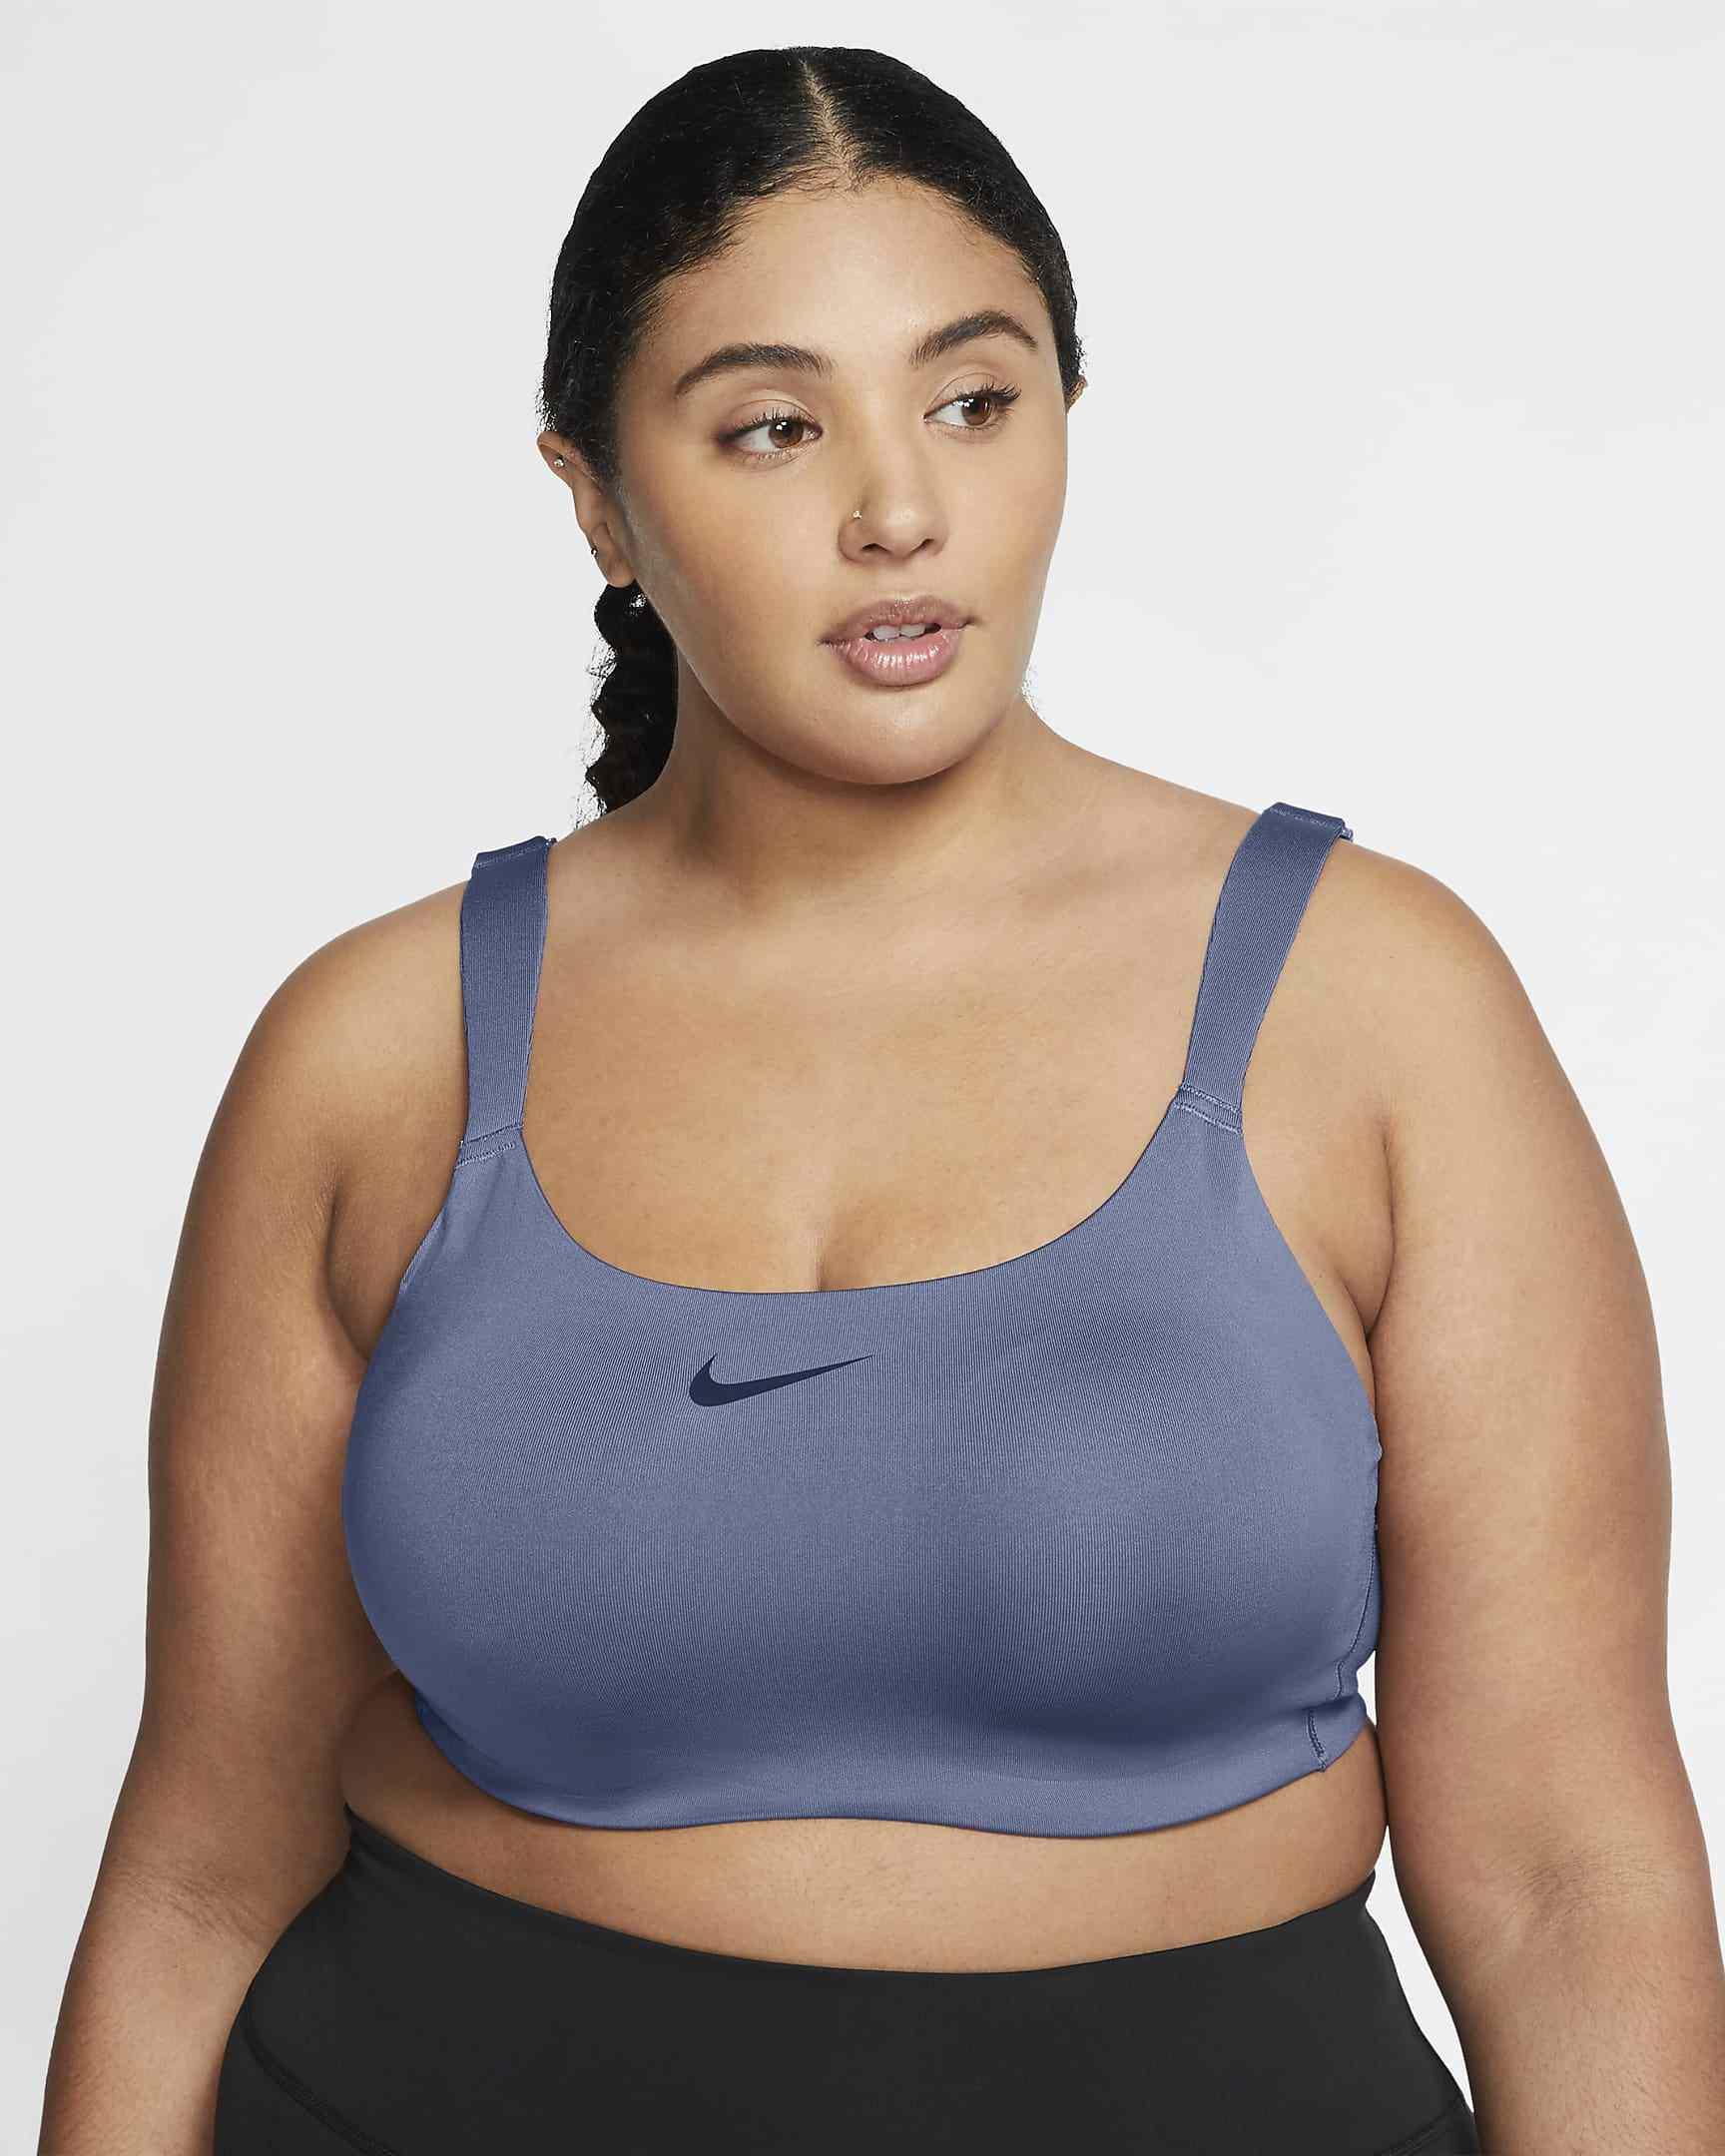 Nike Bold High-Support Underwire Sports Bra